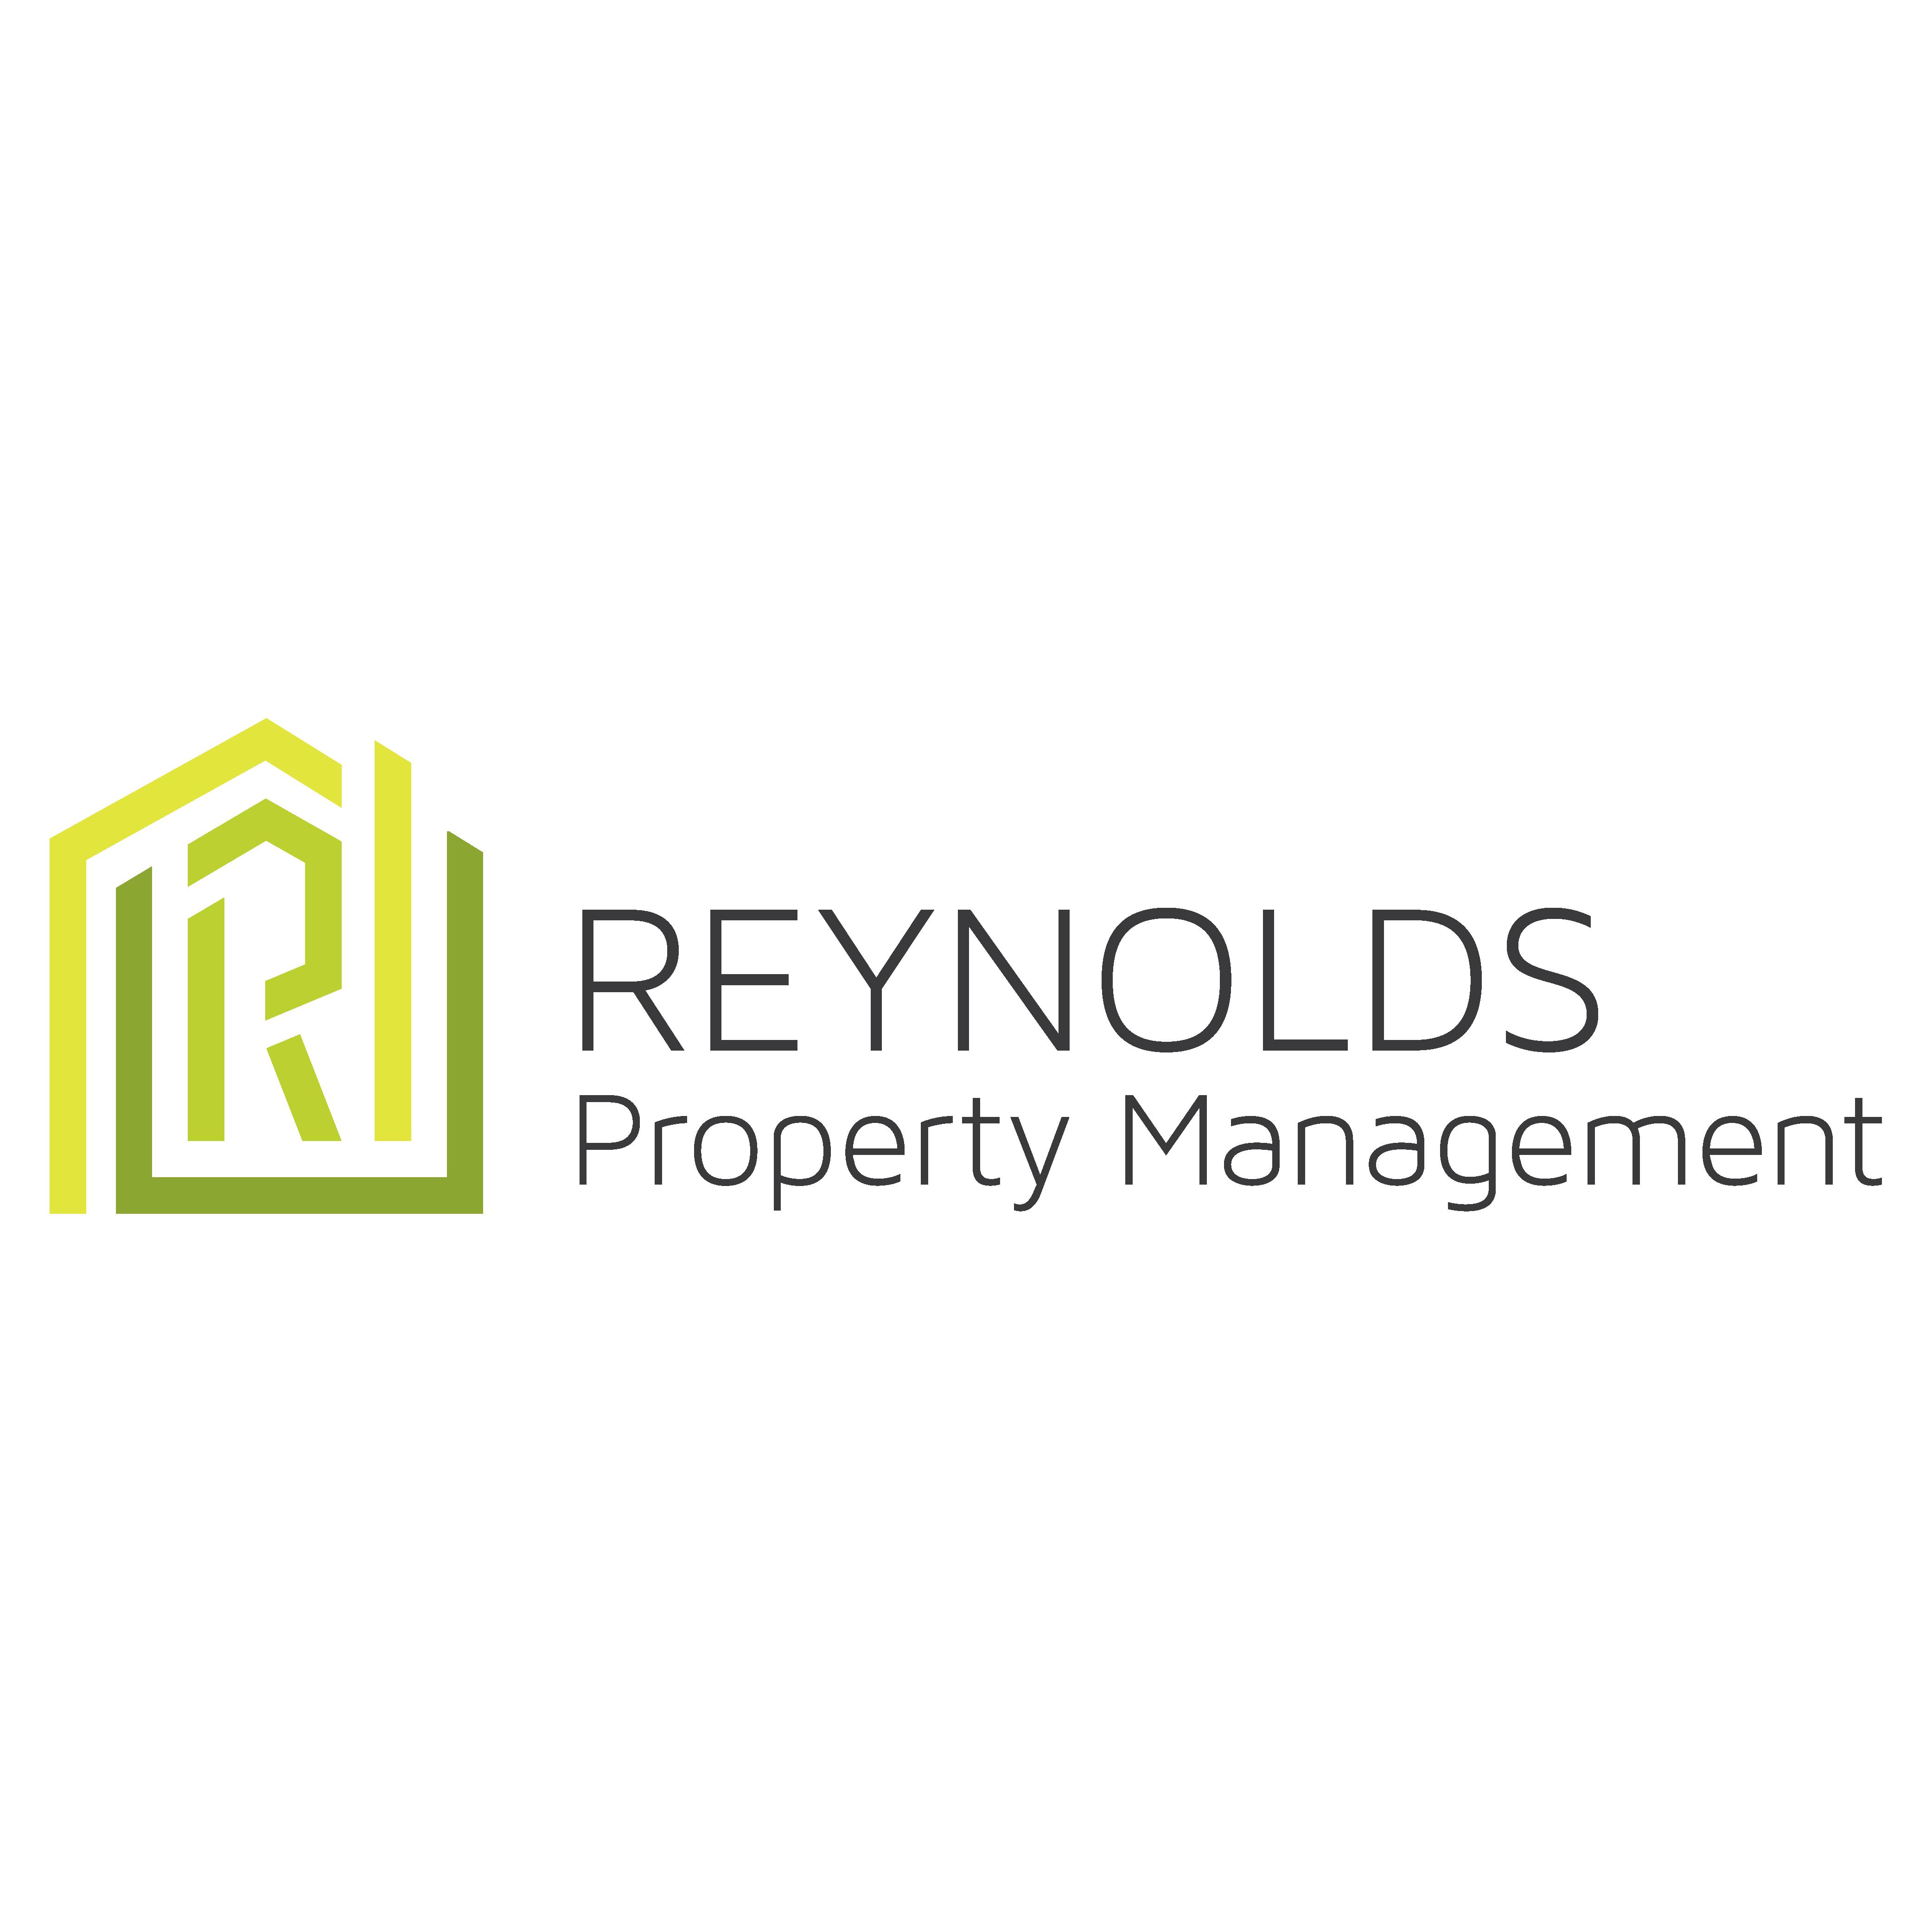 Reynolds Property Management Logo